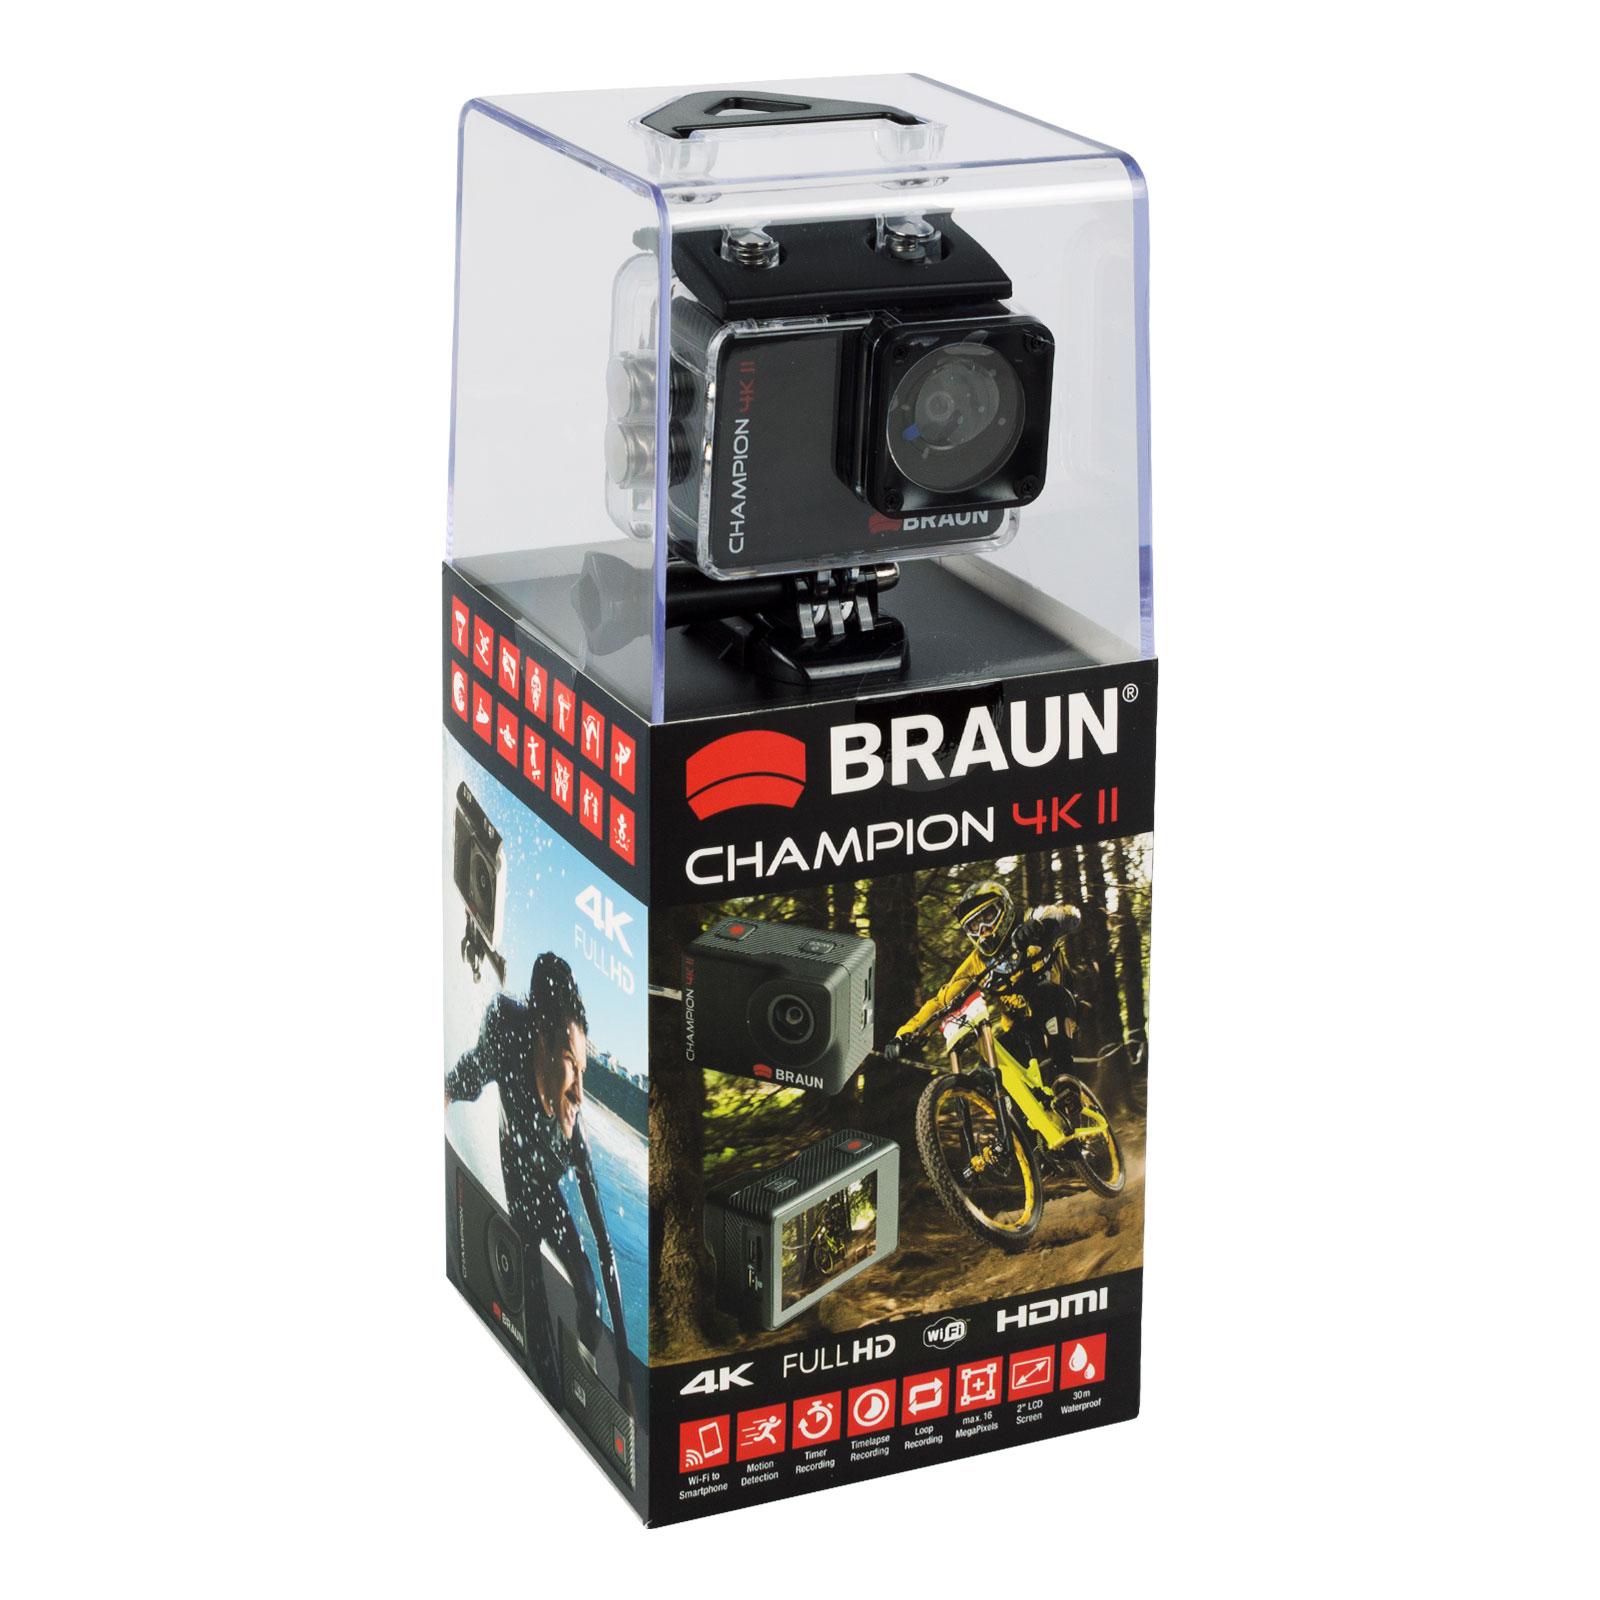 11520000153_Braun_Champion_II_4K_Action_Cam_1600.jpg